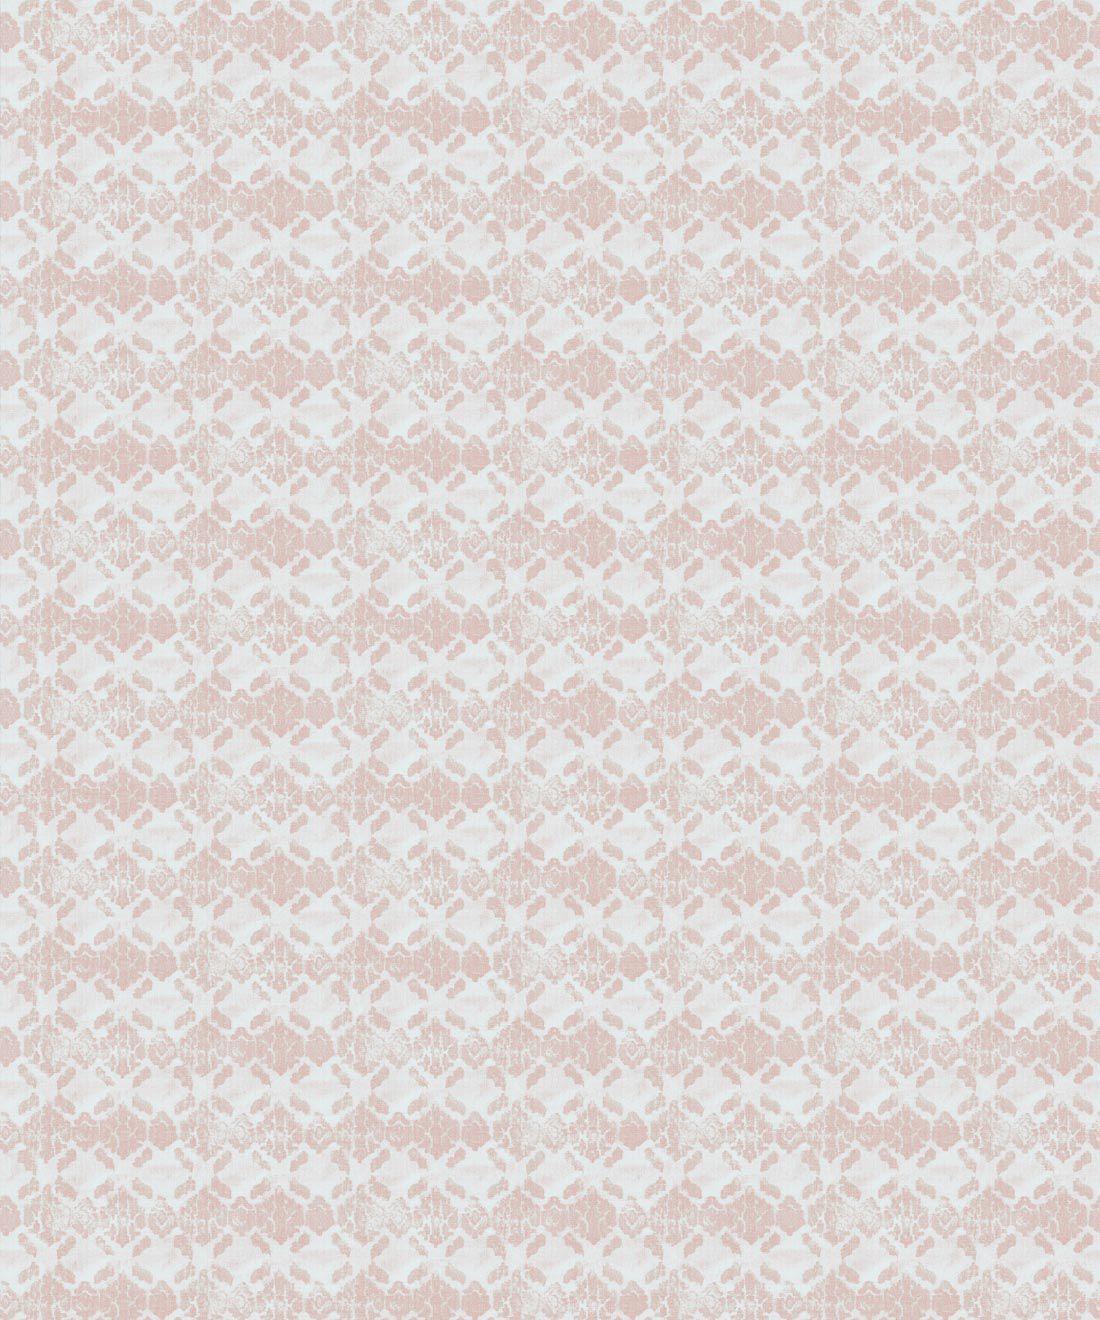 Peach Ikat Wallpaper • Shibori